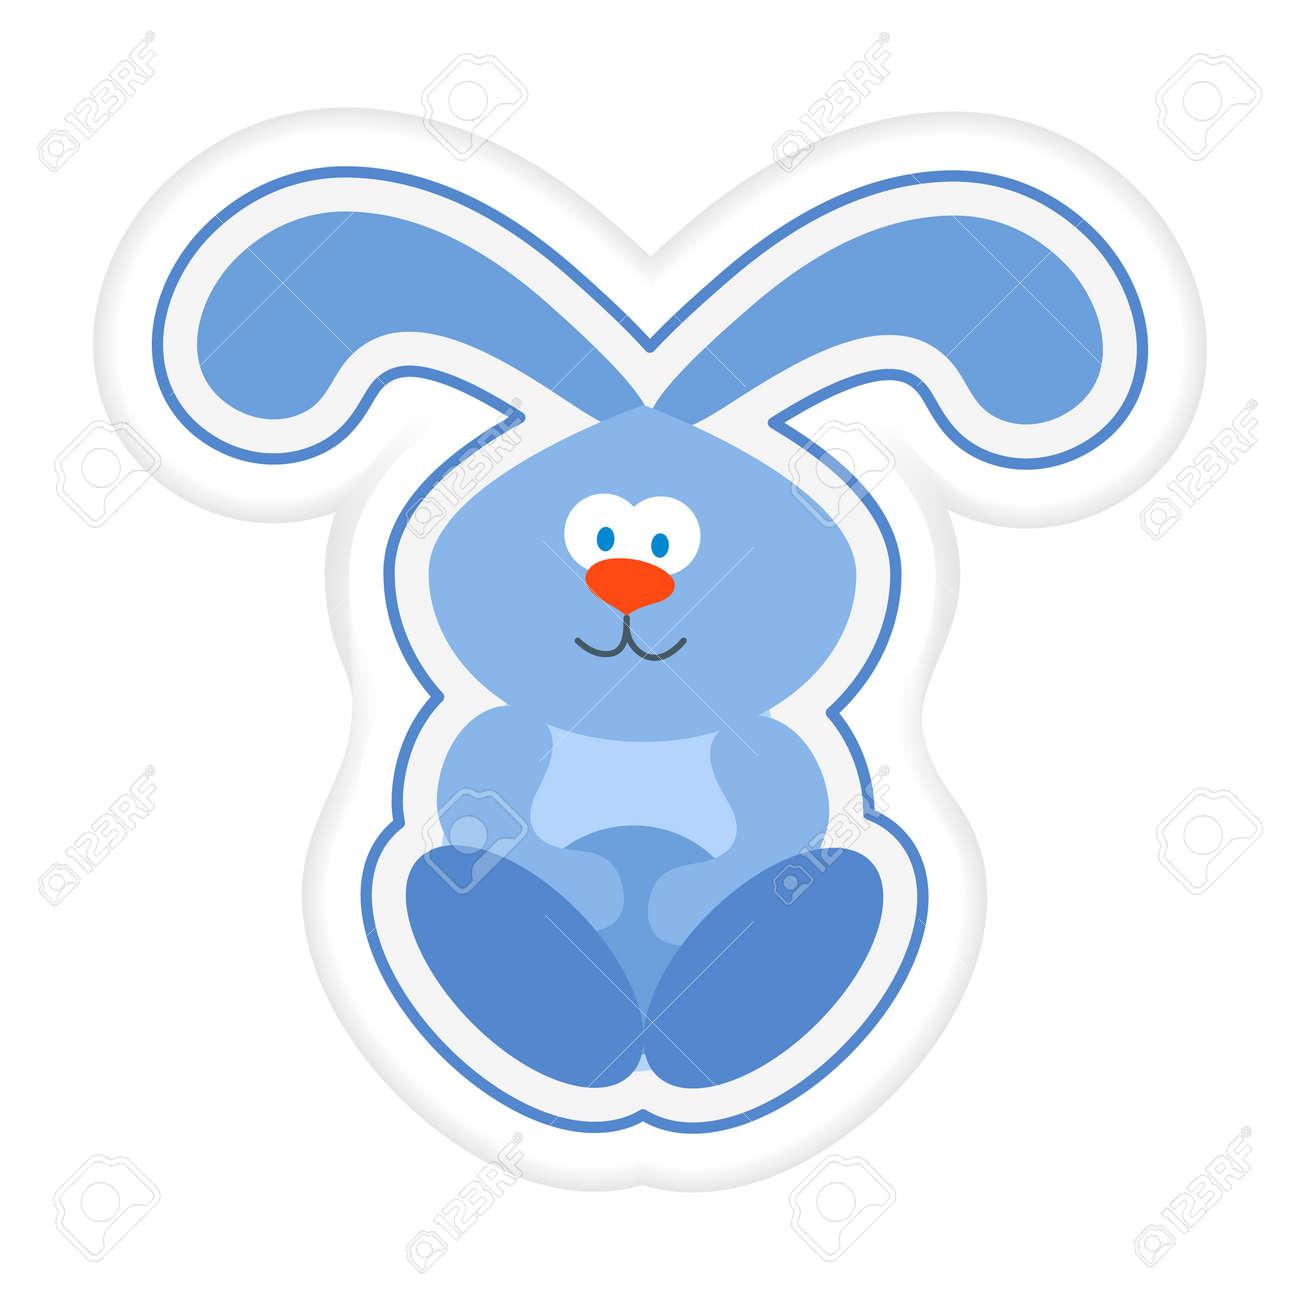 Vector illustration Kid toys Sticker Hare rabbit Bunny Primary school, elementary grade, kindergarten. Happy childhood. Activity. Game. Play. Design for print - 170178256